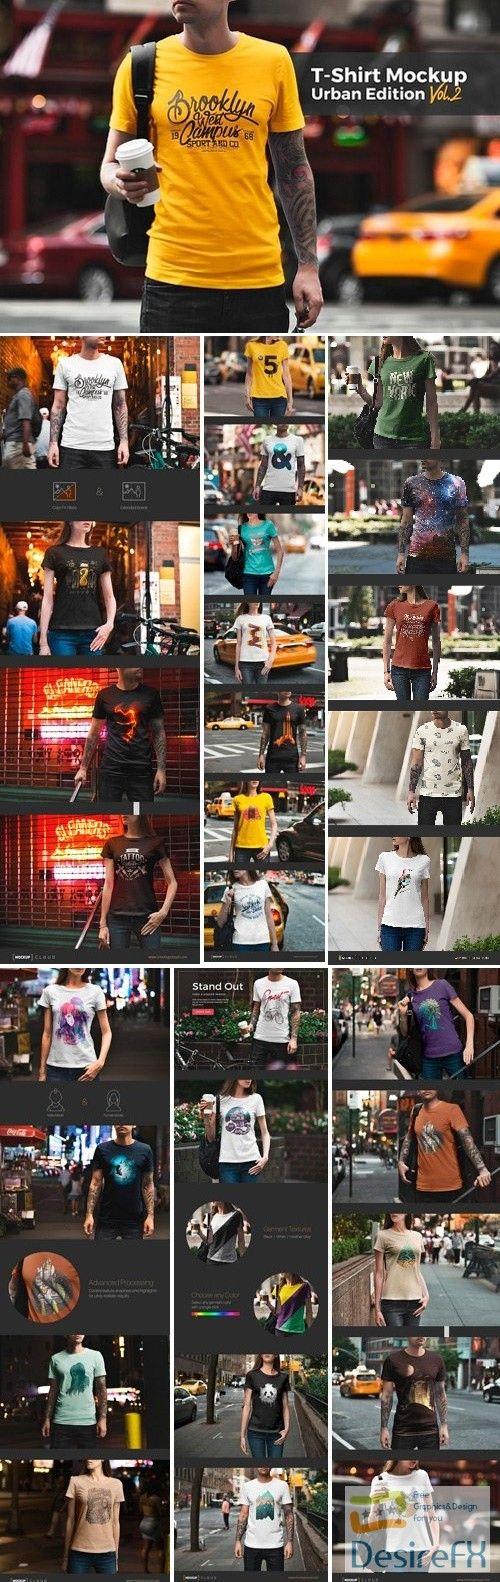 Download T Shirt Mockup Urban Edition 1664349 Tshirt Mockup Shirt Mockup T Shirt